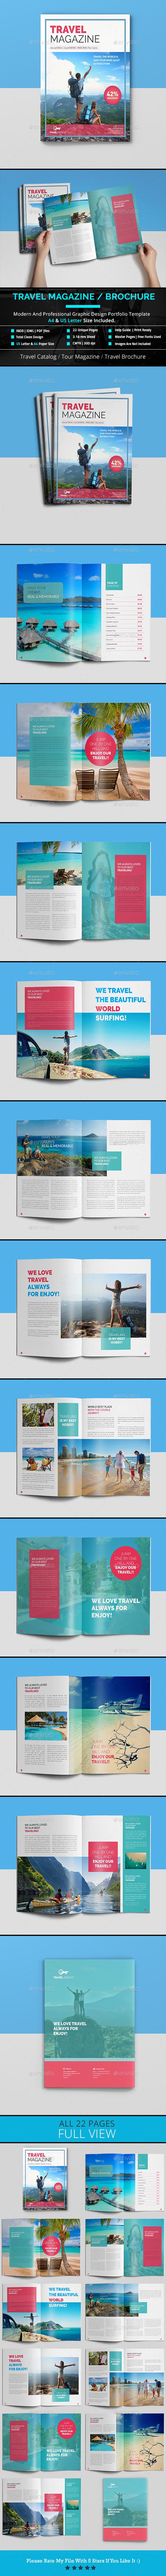 Travel Magazine / Cataloge - Magazines Print Templates